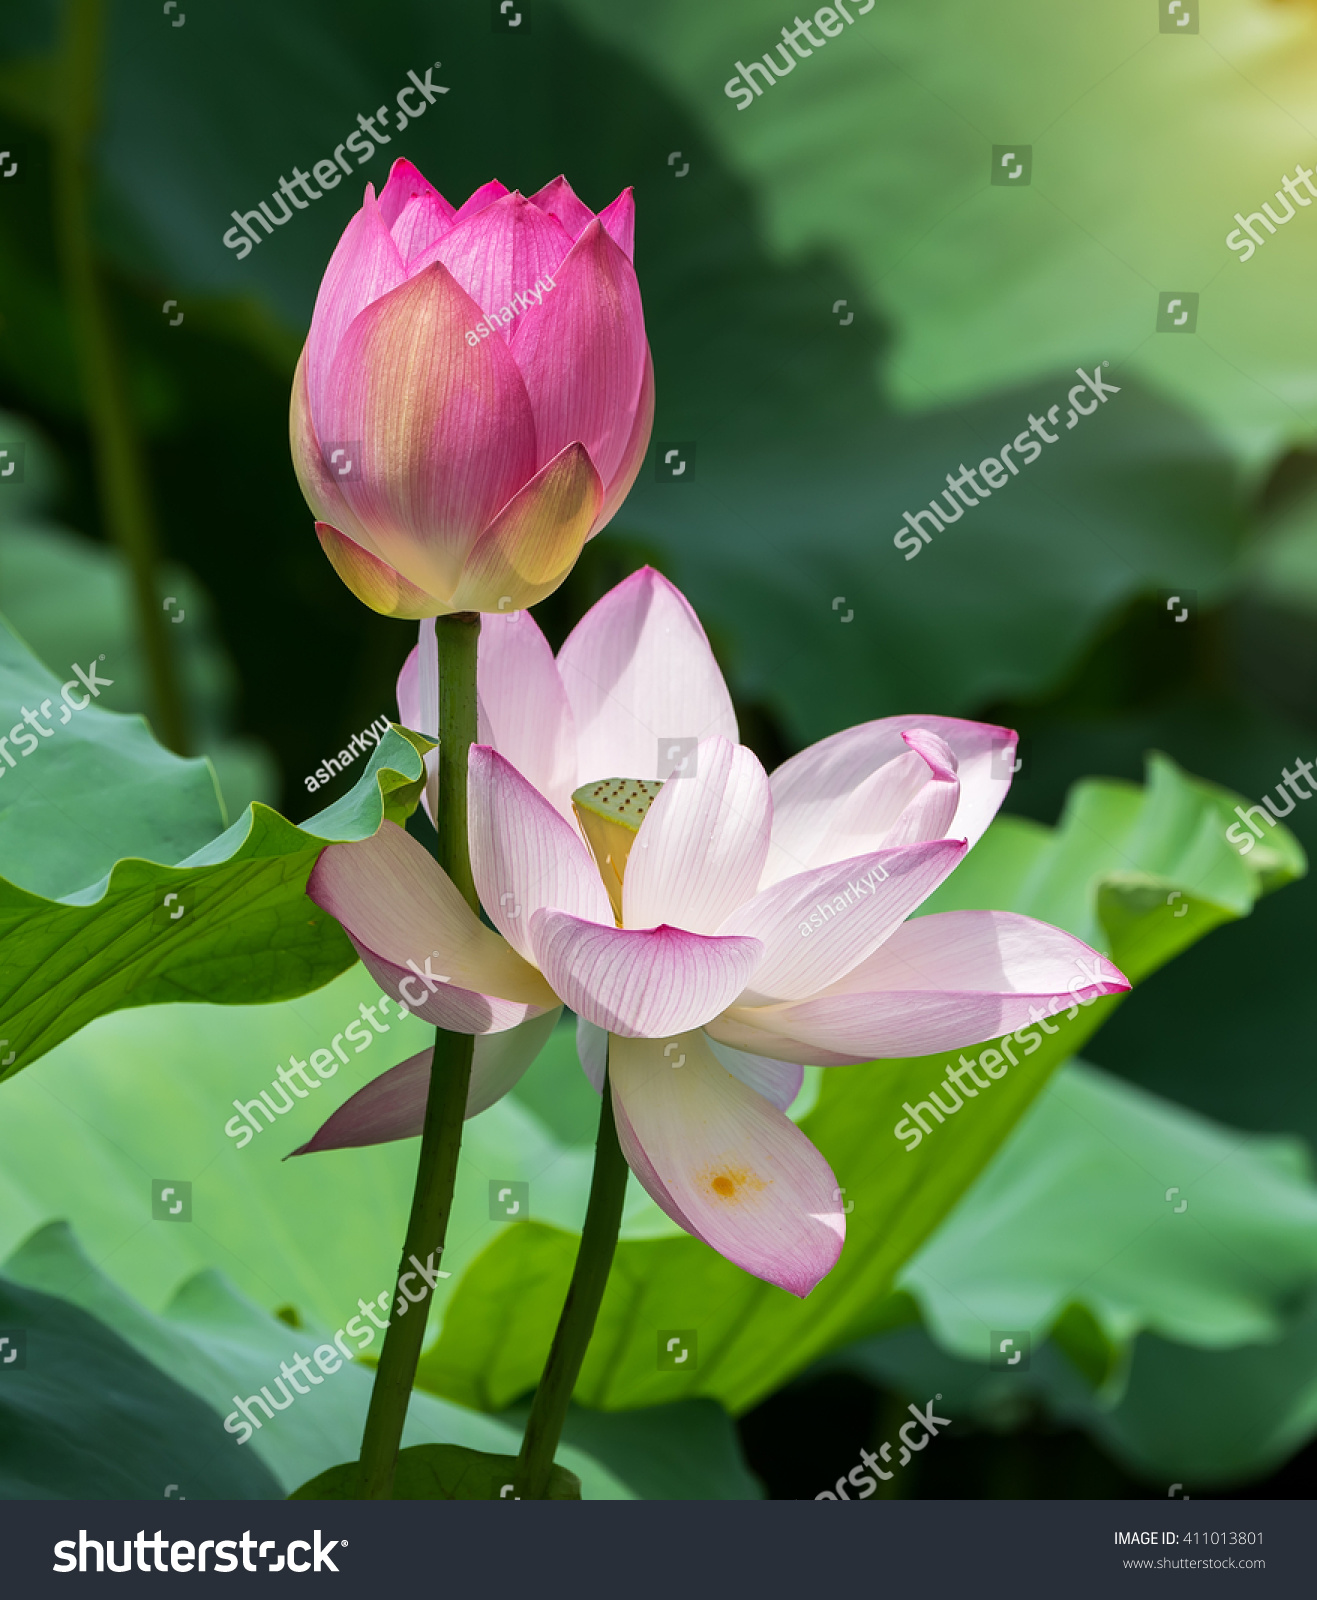 Lotus Flower Lotus Flower Plants Stock Photo Safe To Use 411013801